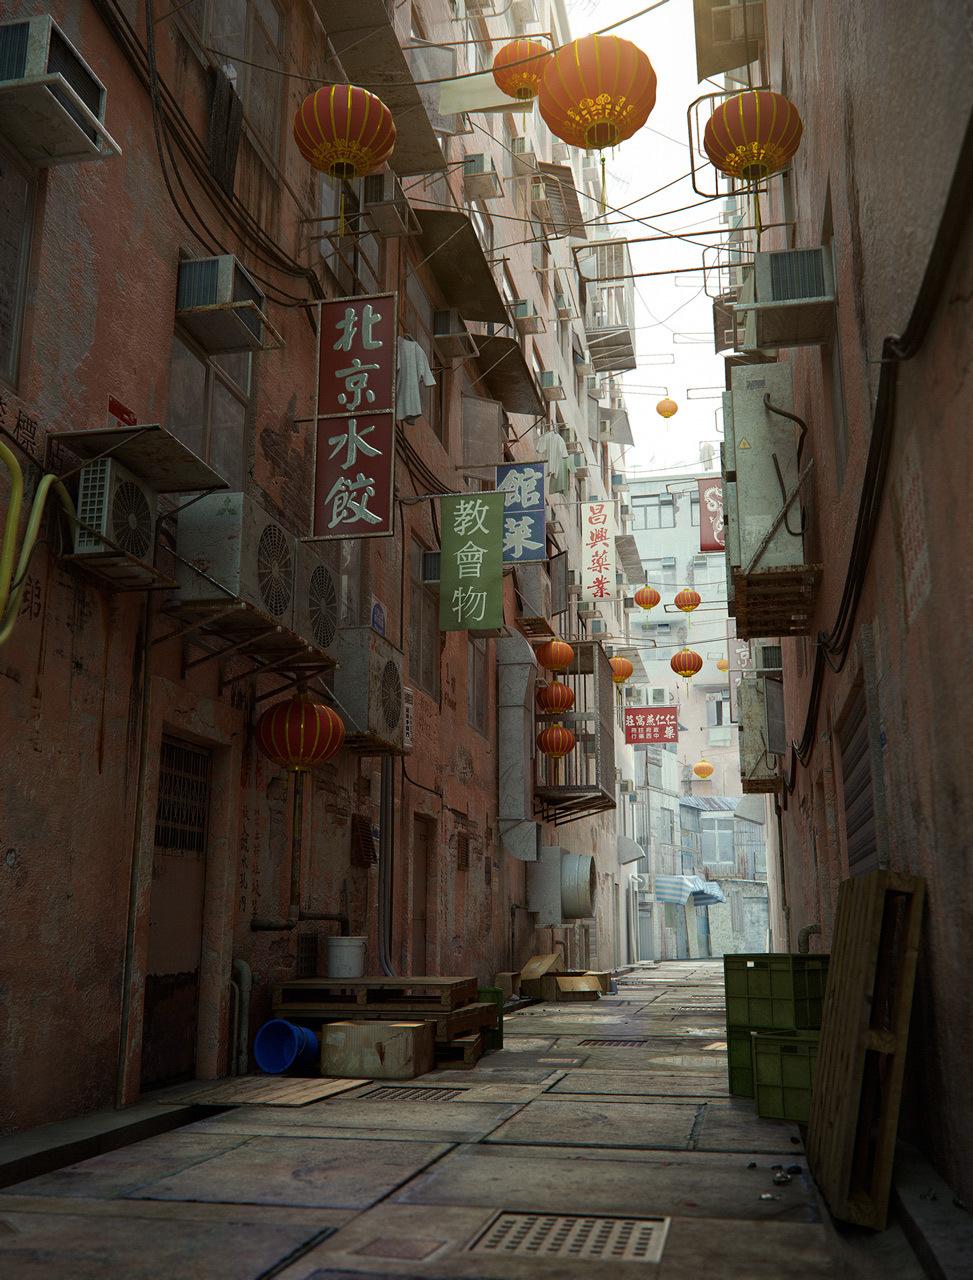 Linden stirk kowloon alley 1 fbafcc69 9u0u